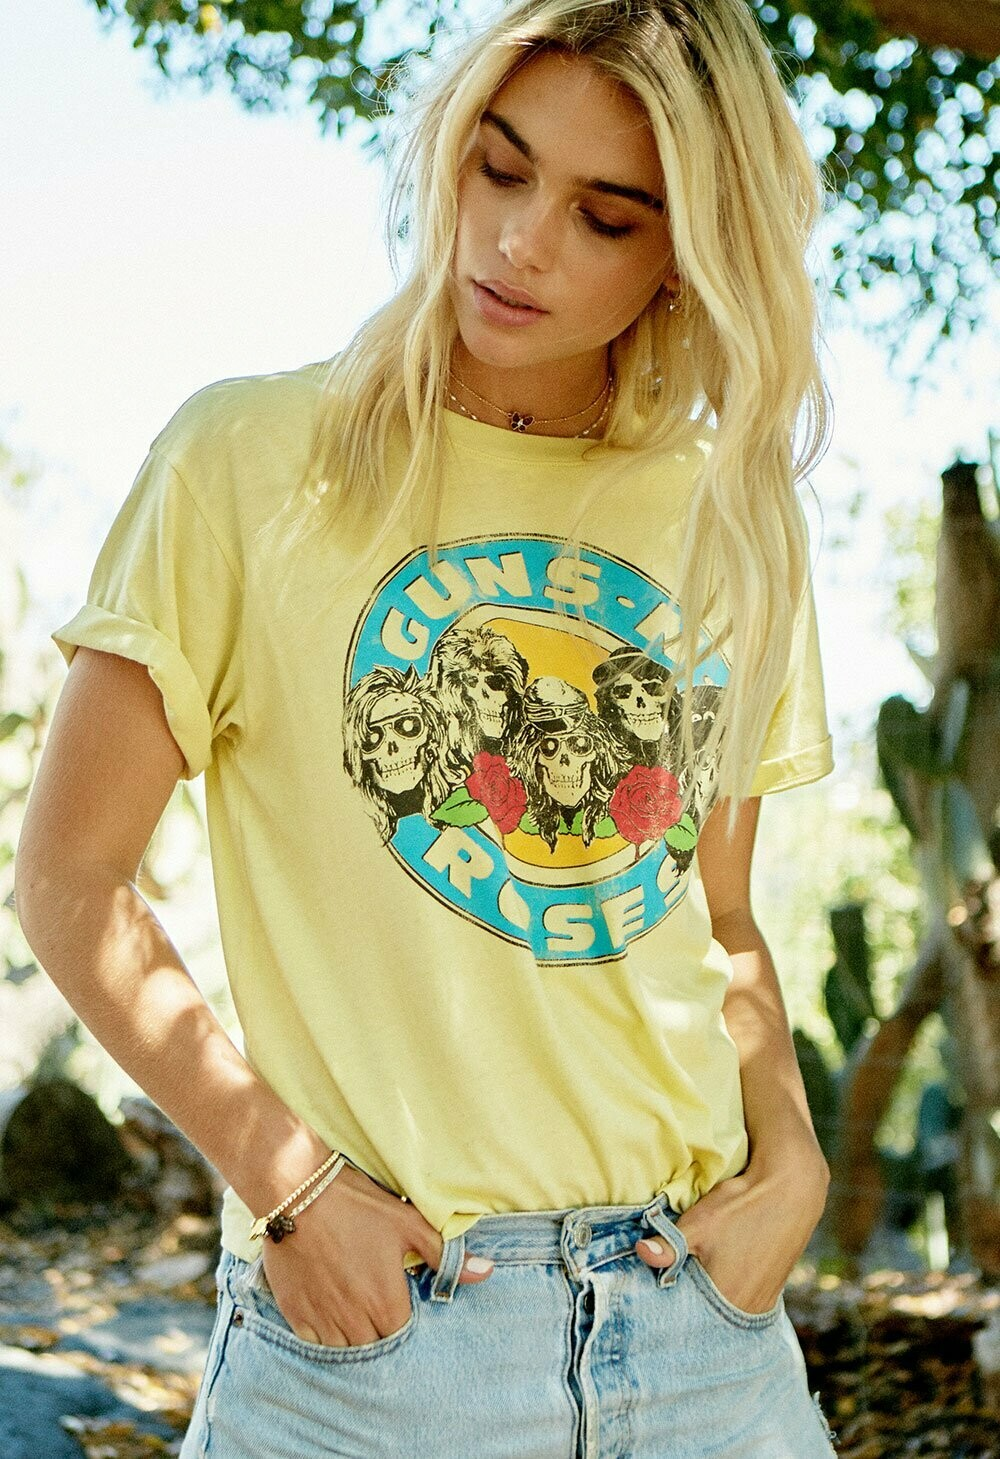 Daydreamer Women's Guns N' Roses Welcome to the Jungle Tee